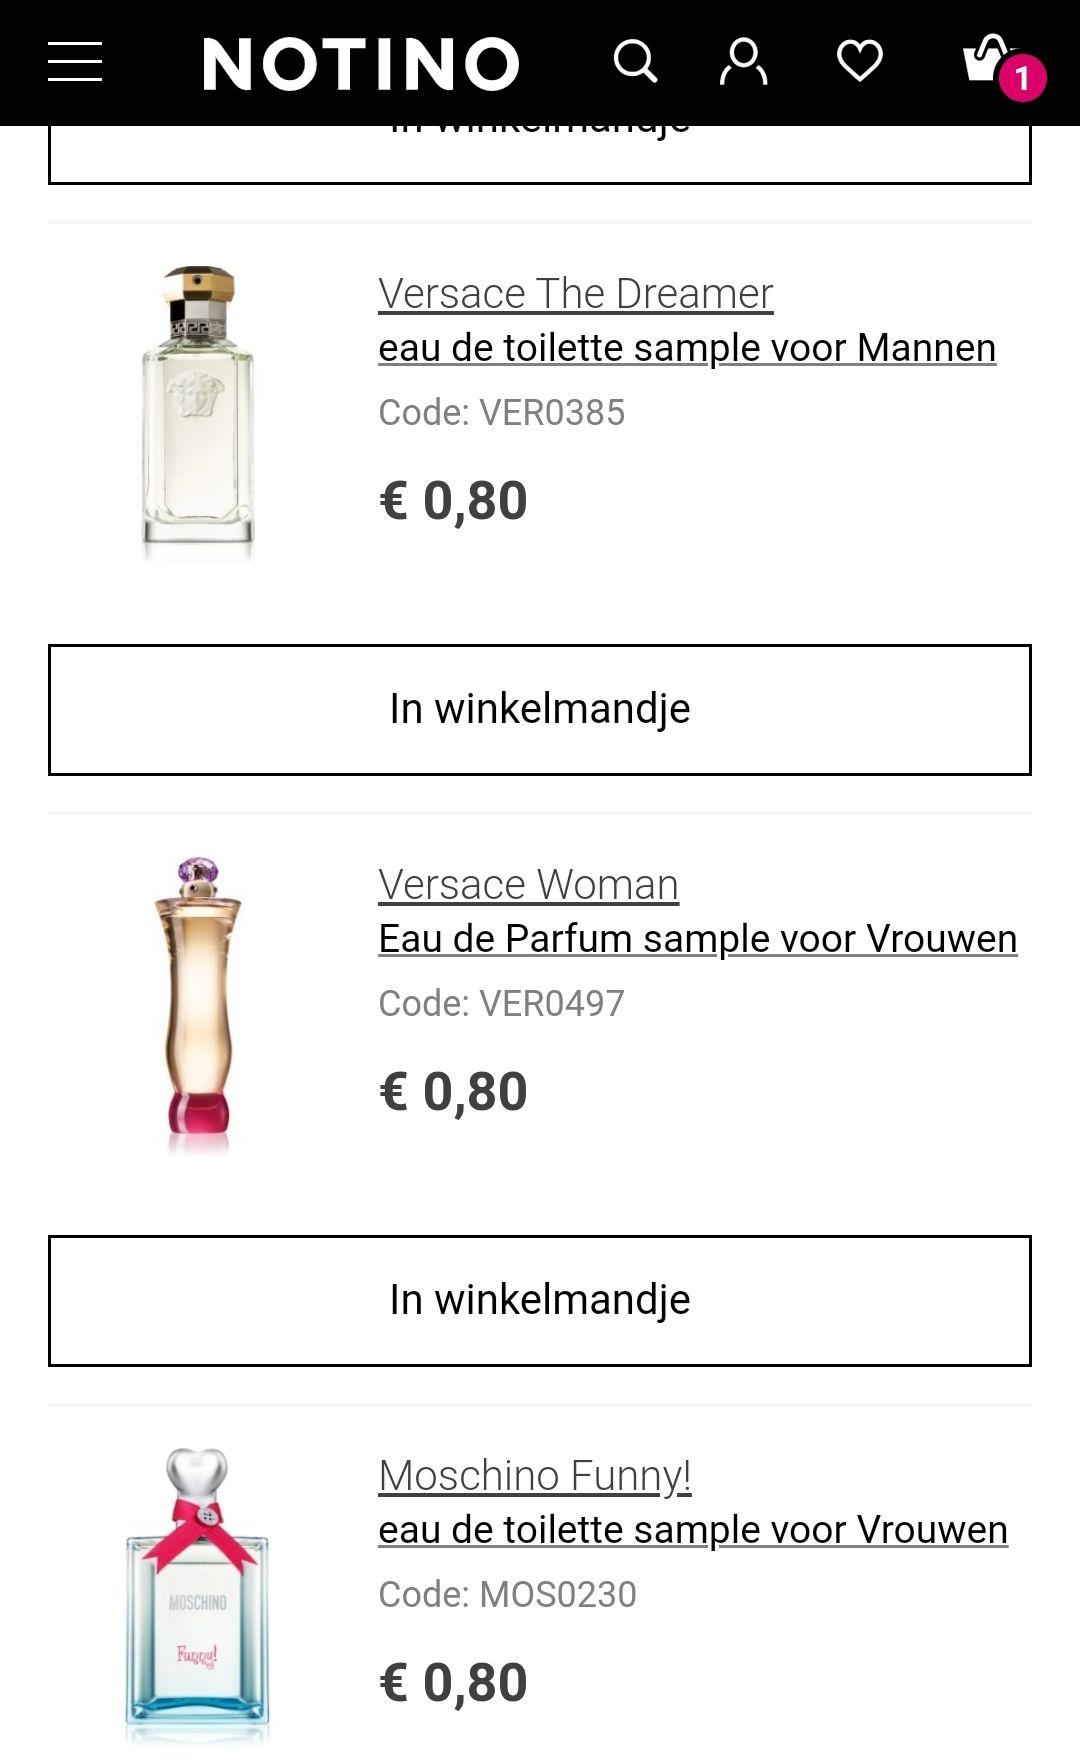 Parfum samples